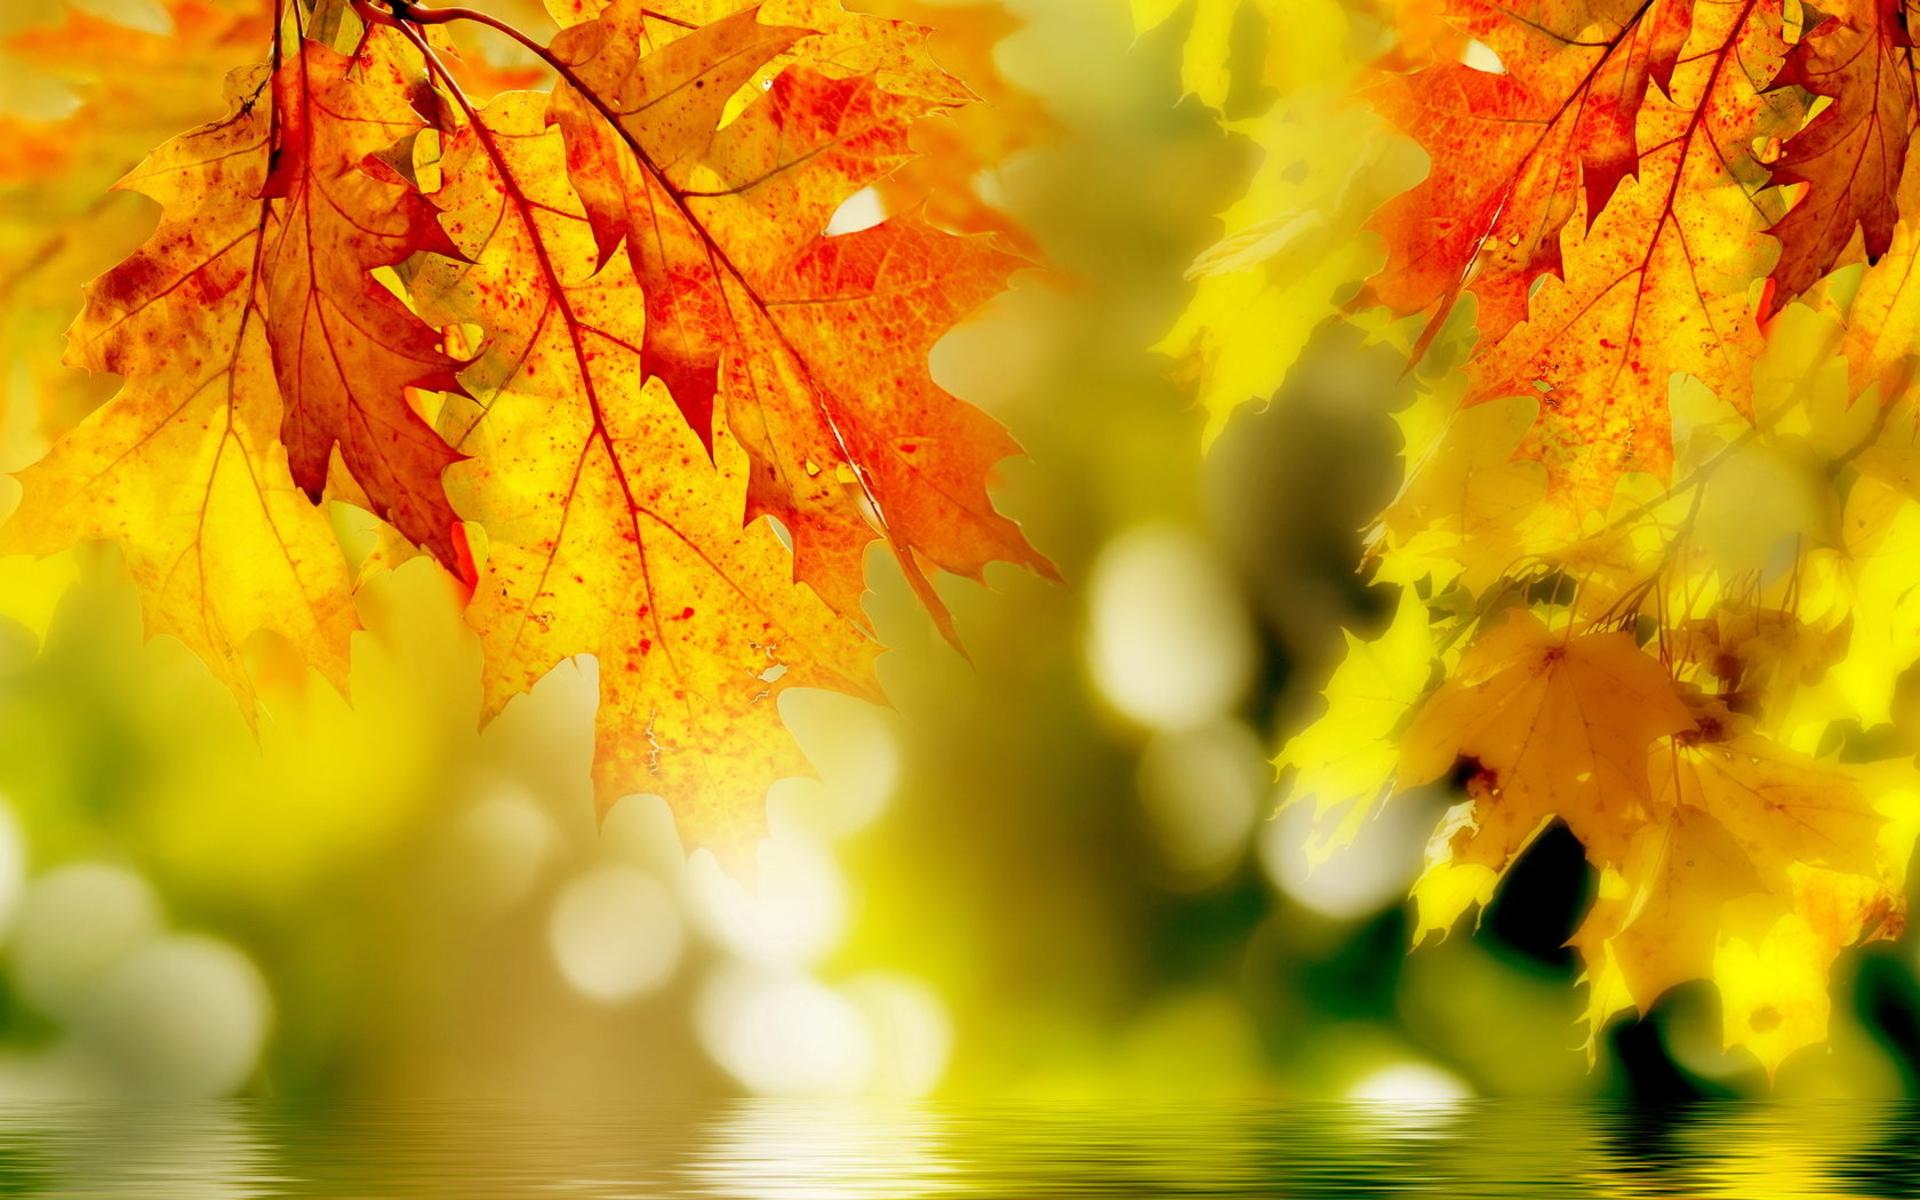 Autumn Relief By Designcrown